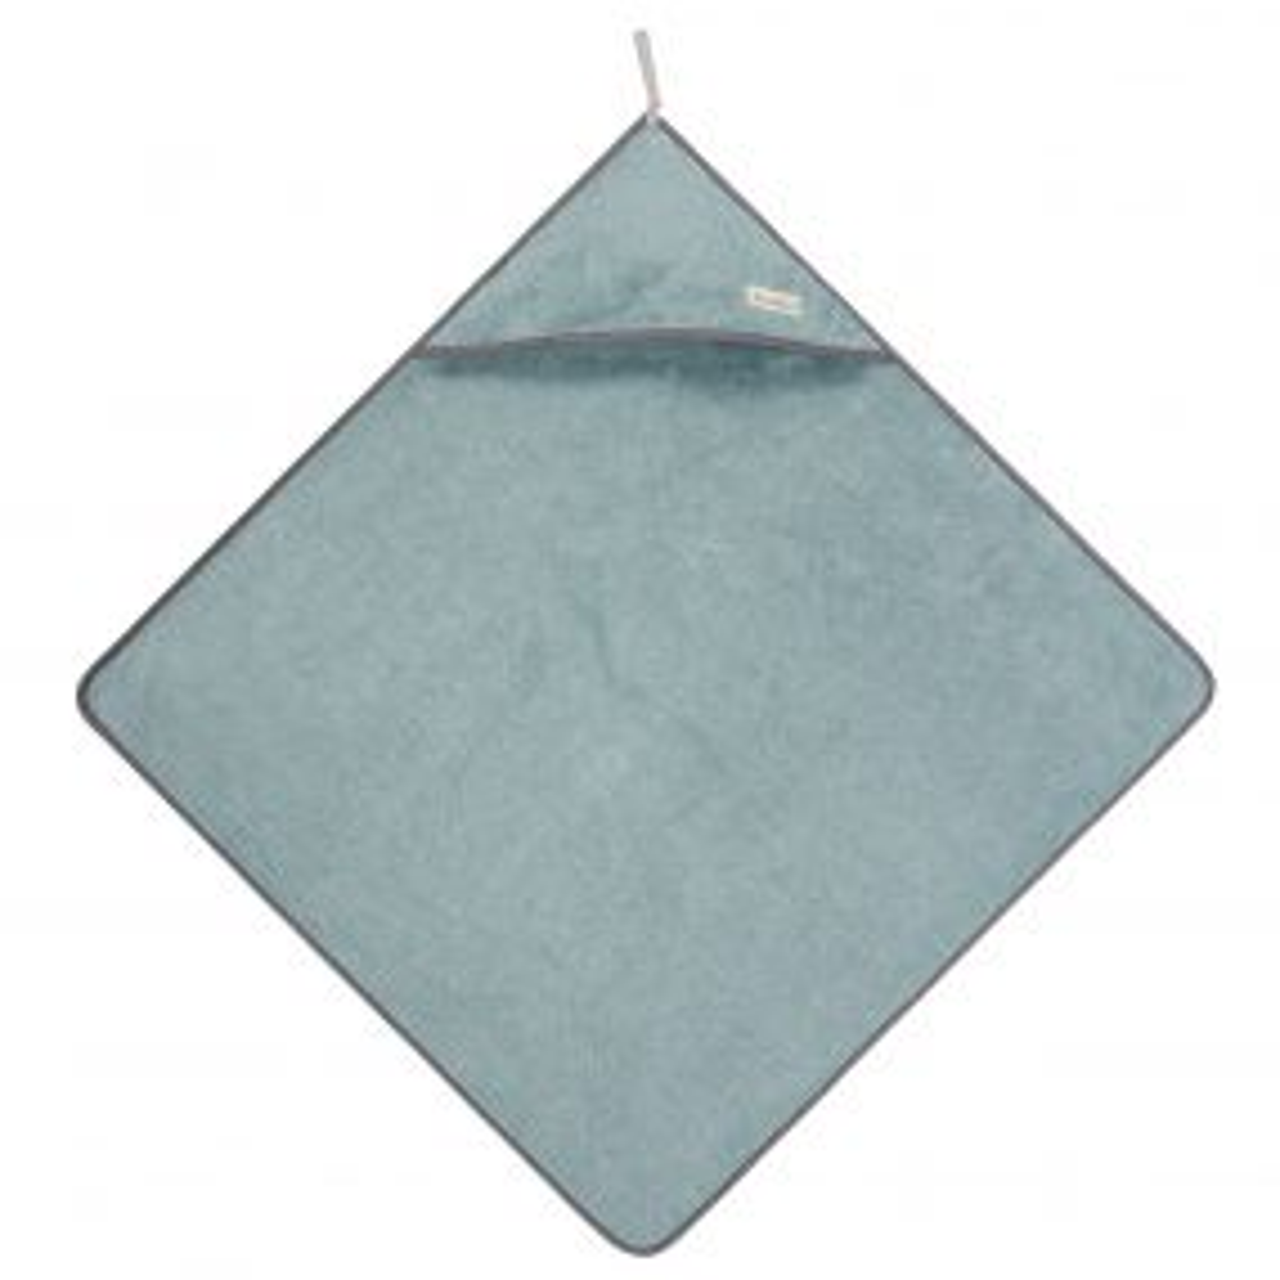 Koeka Badcape Dijon Sapphire